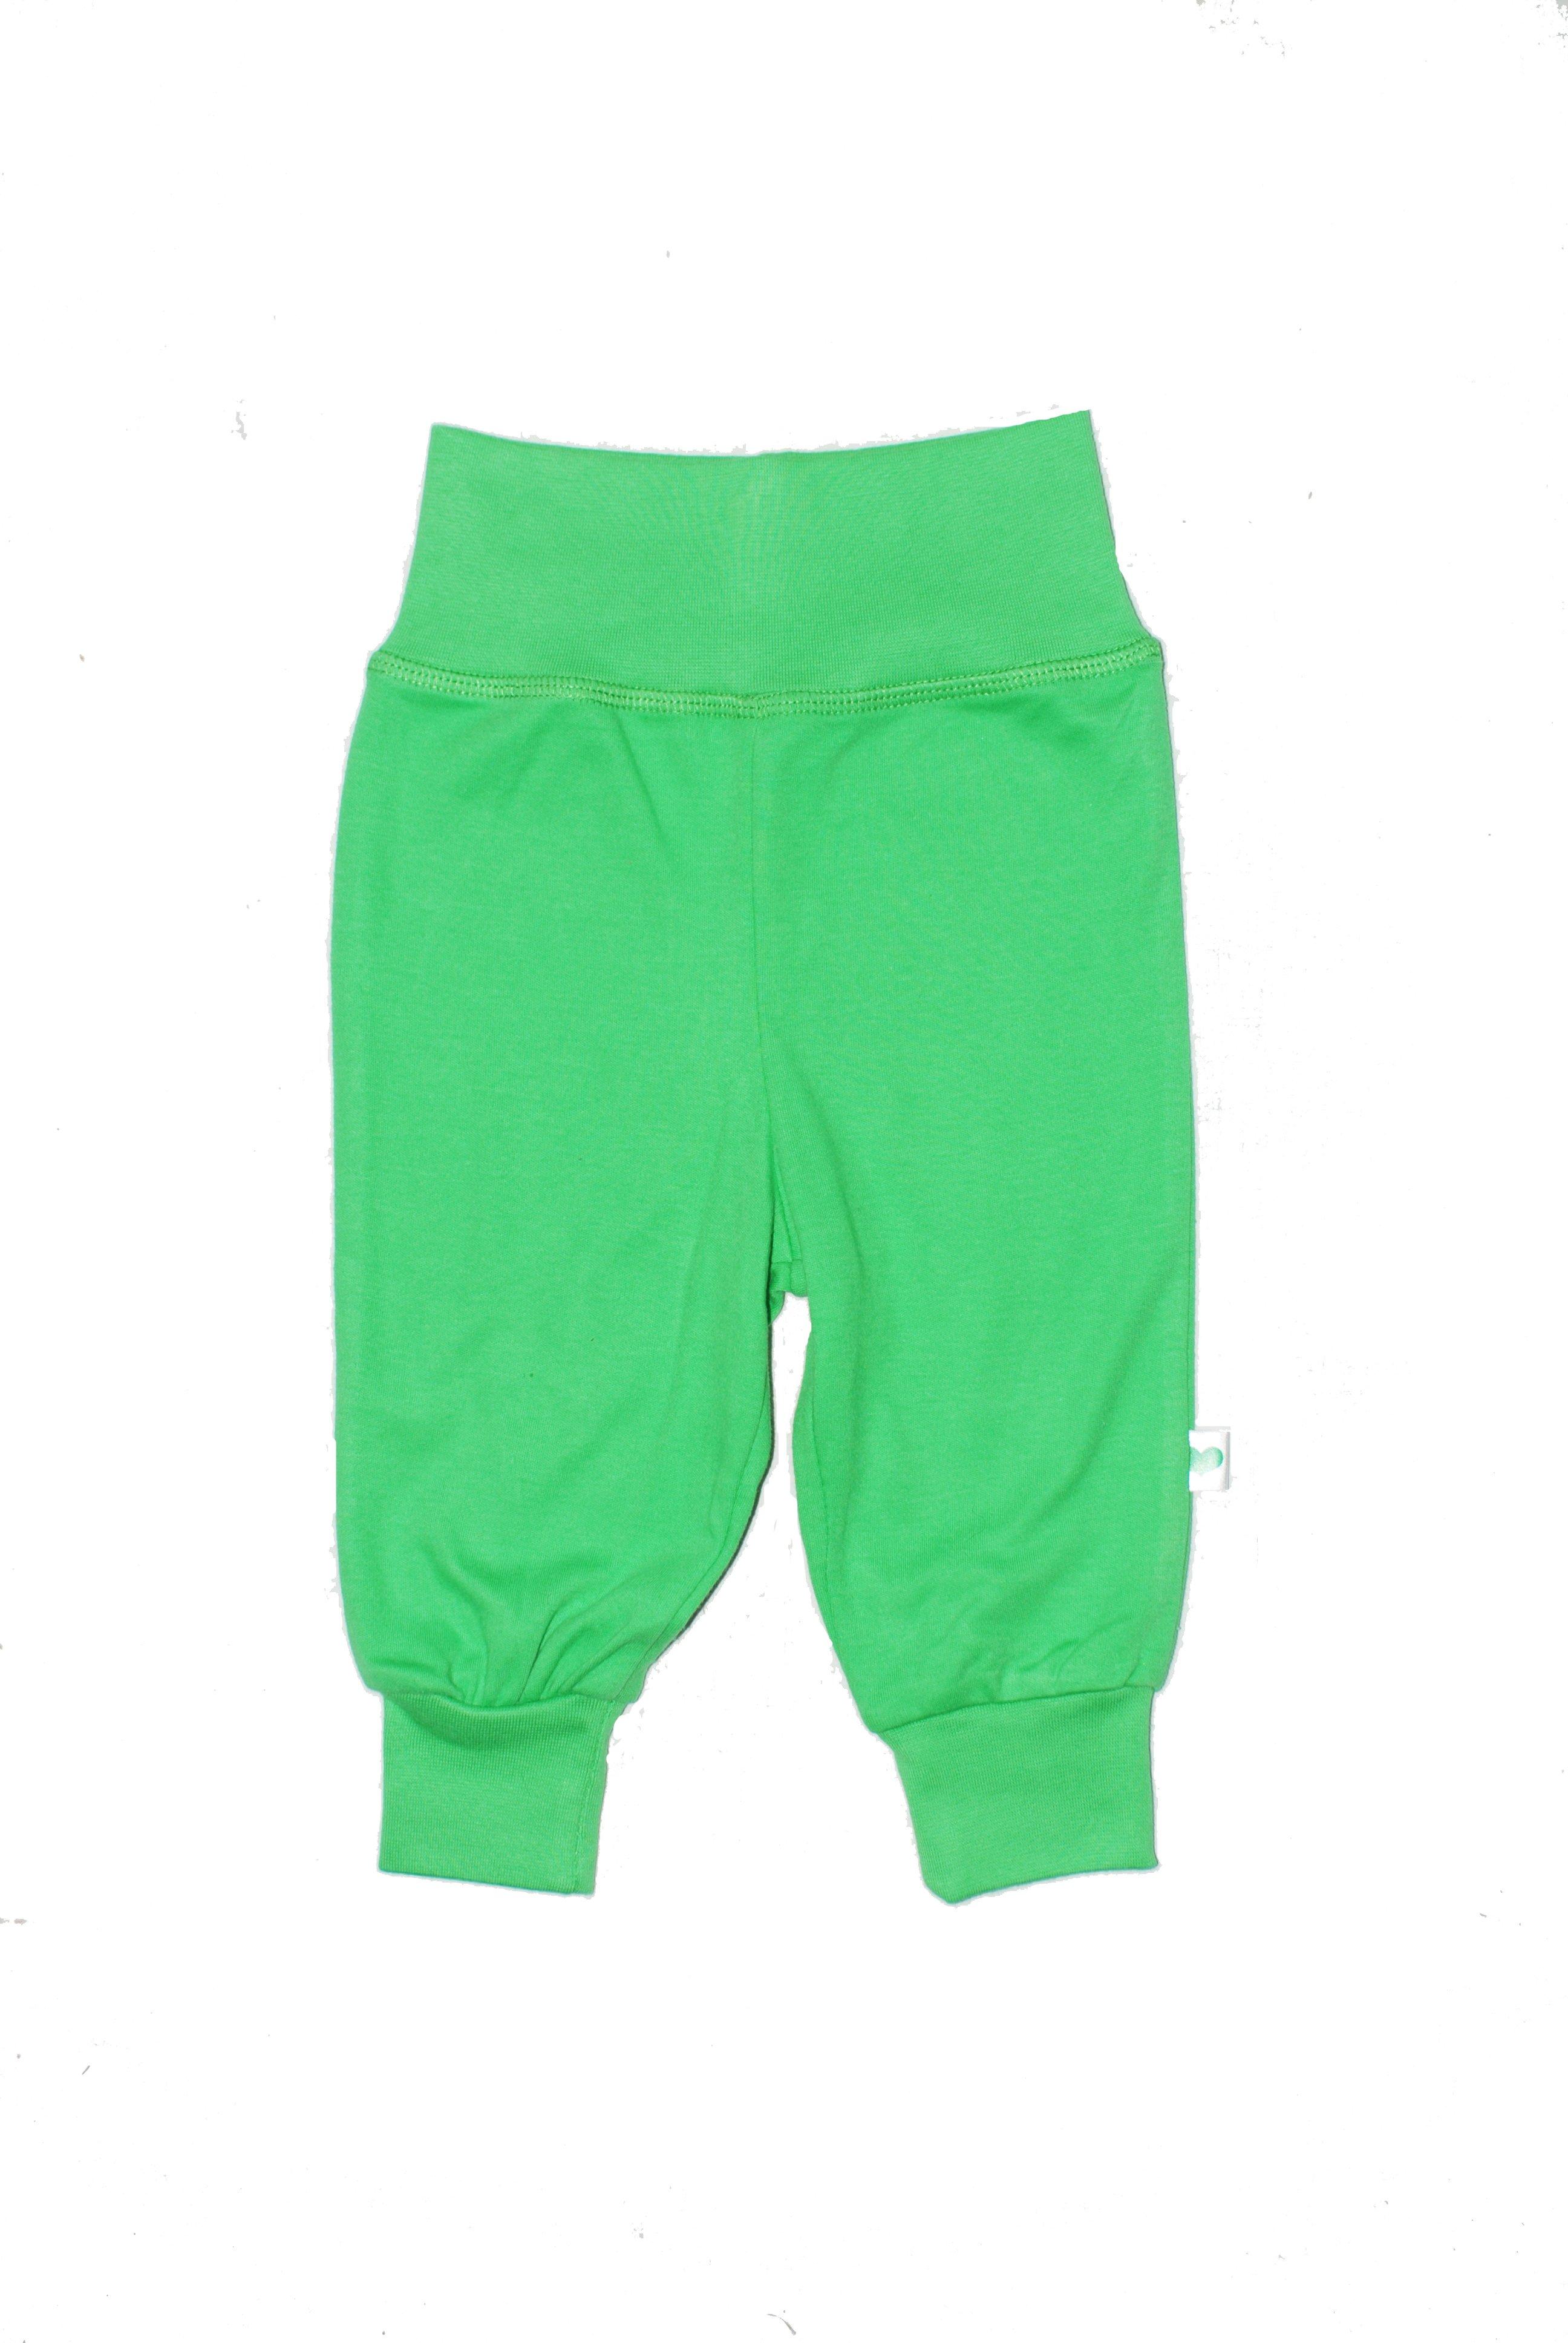 Sture & Lisa pants green